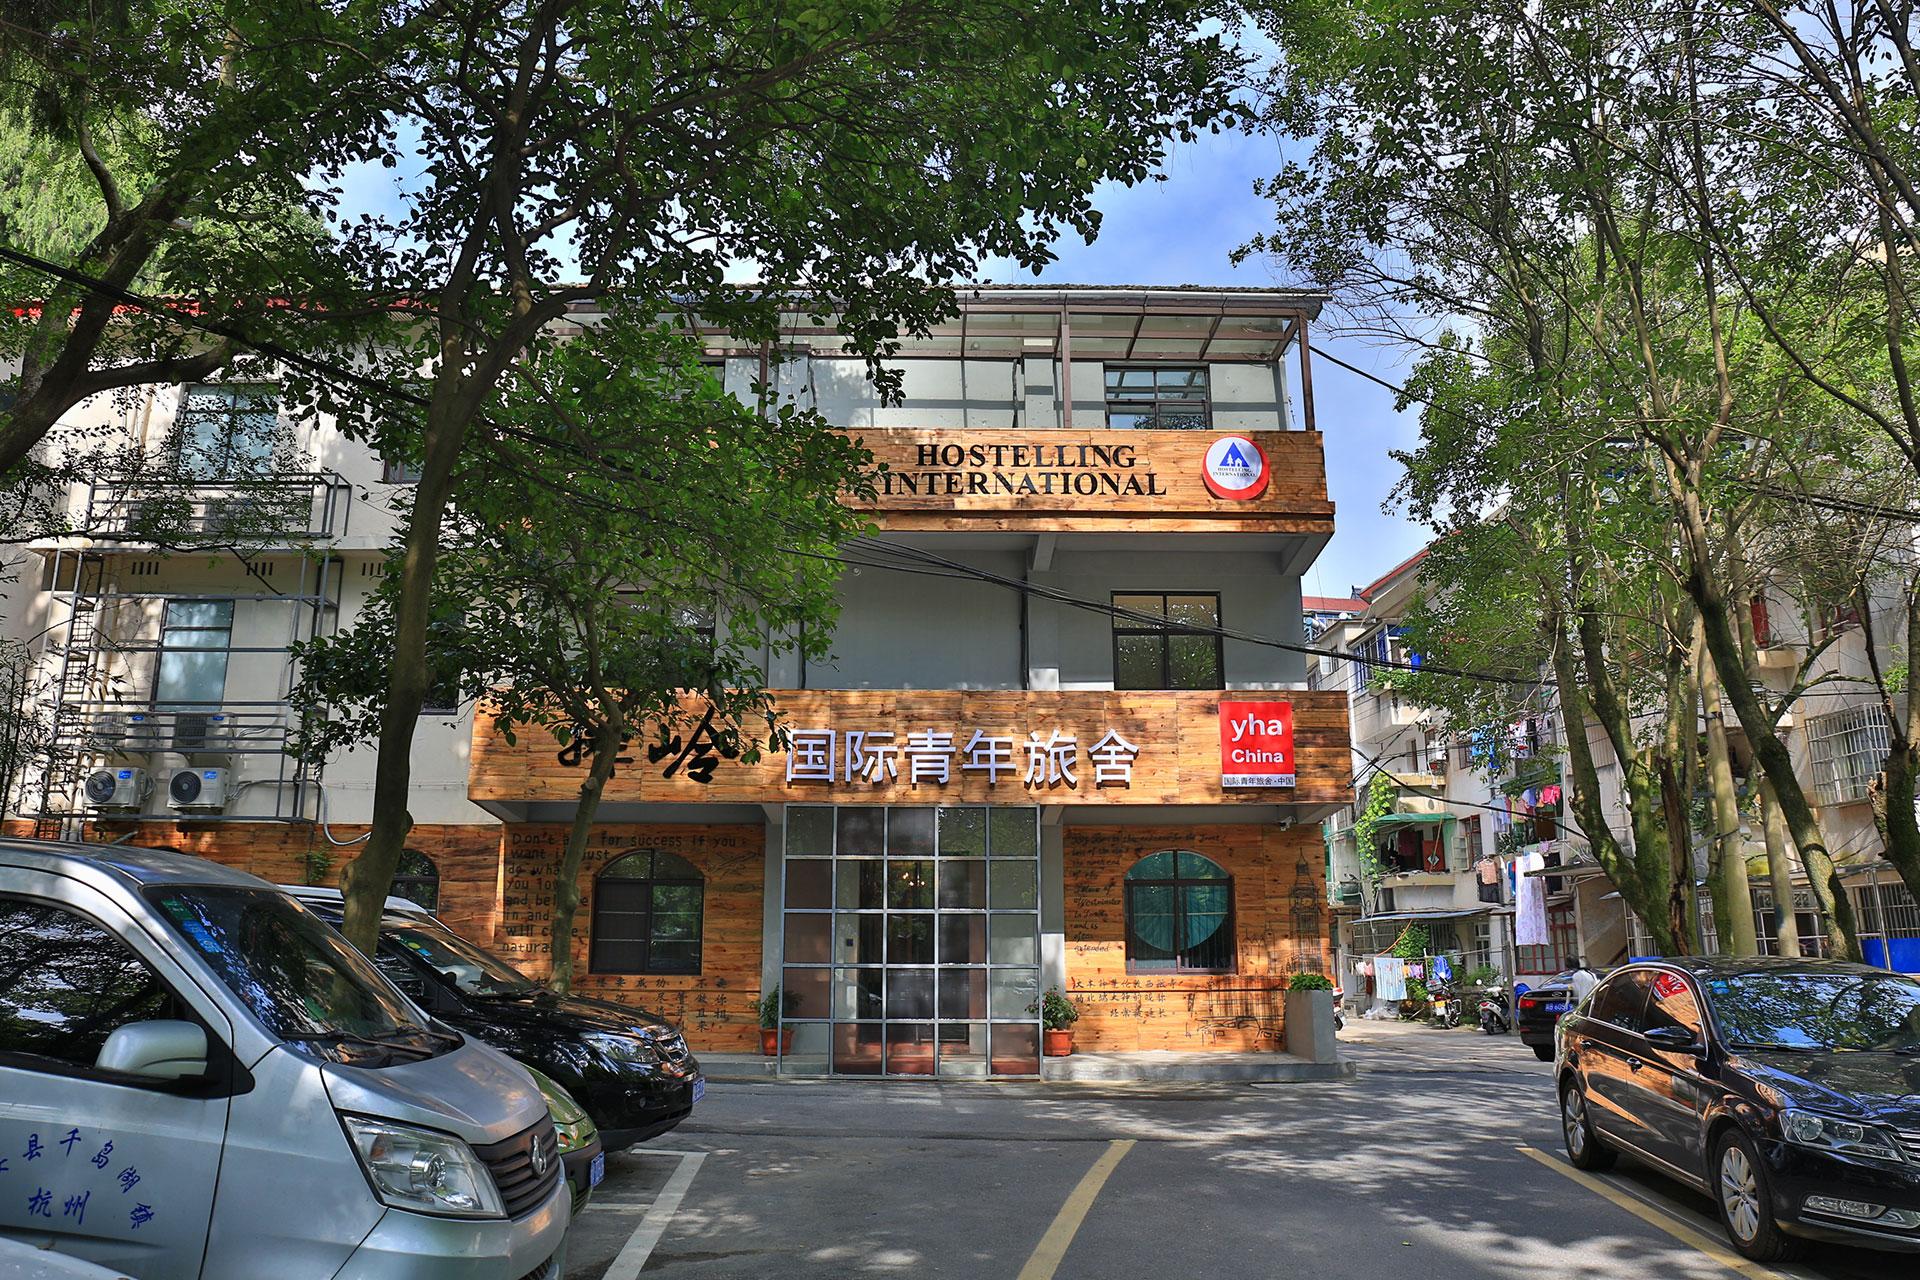 PaiLing International Youth Hostel